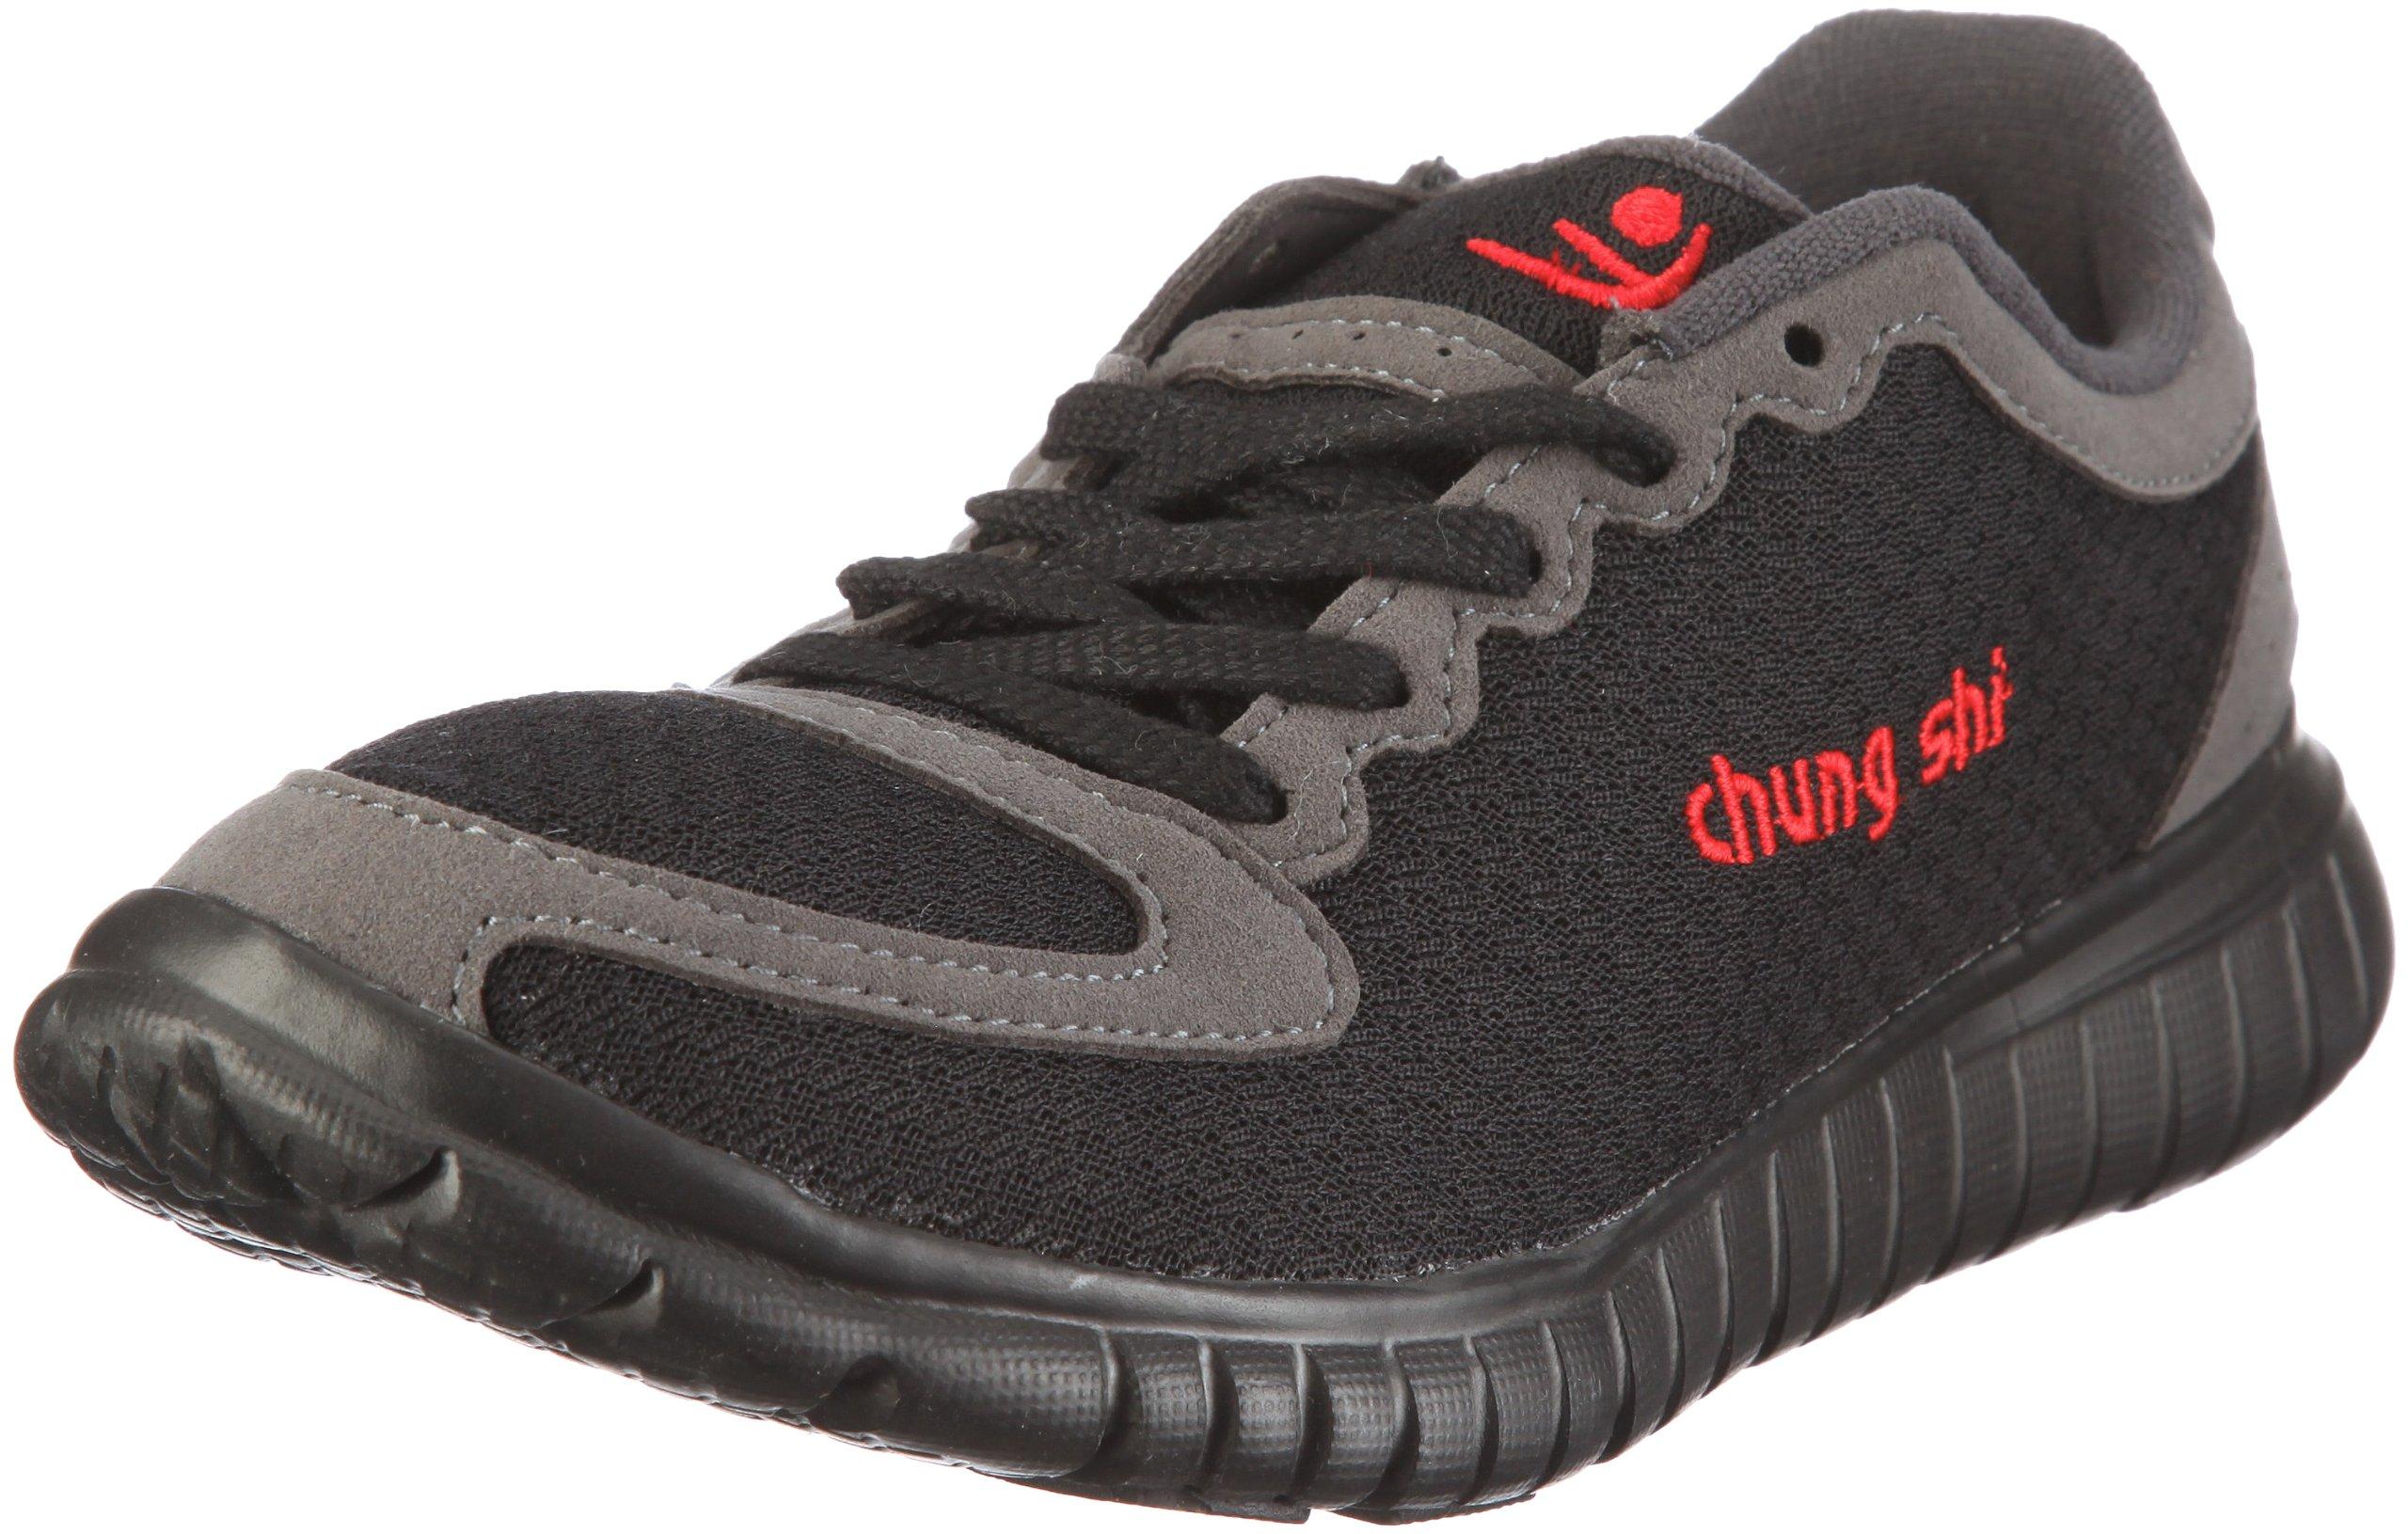 37 Dux Trainer Eu Sydney Chung 636 Mixte AdulteNoir Mode Shi V 8800230Baskets Qrhtds